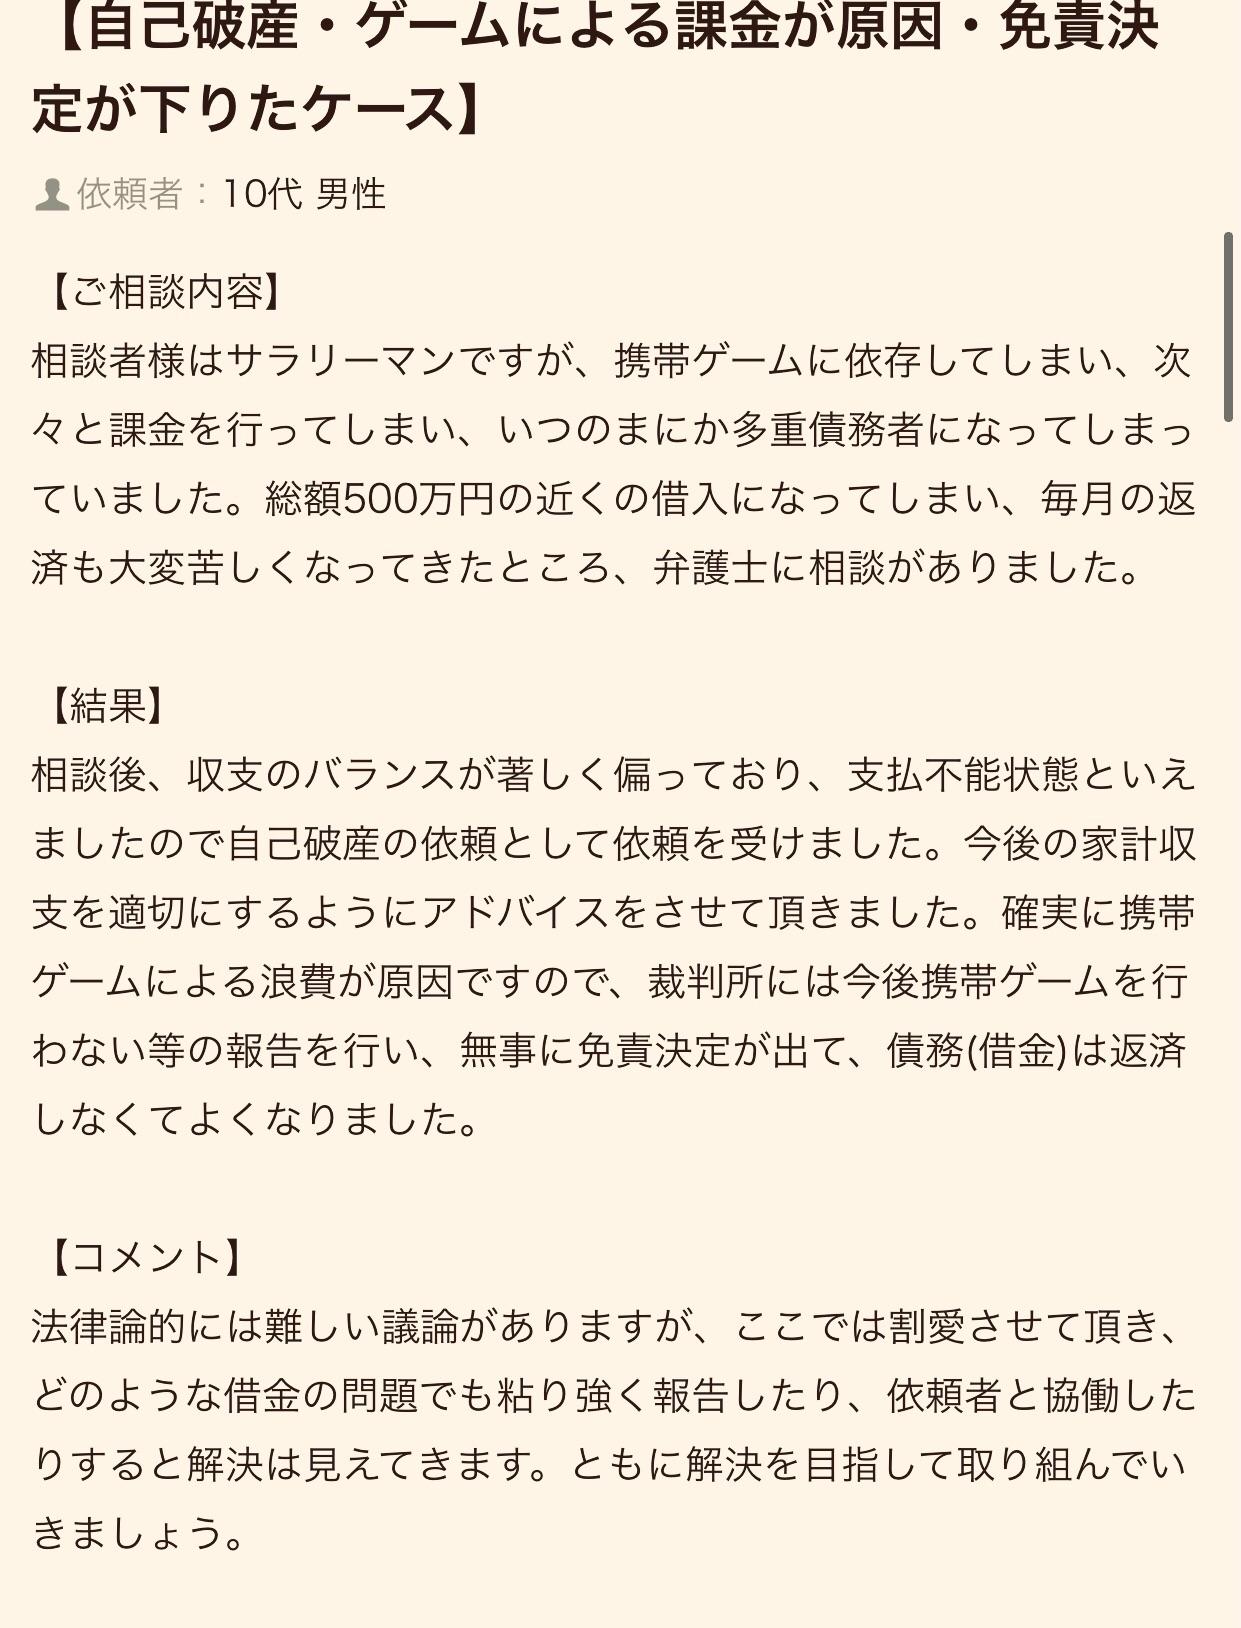 f:id:kagaribi-kotsujiko:20210122225142j:plain